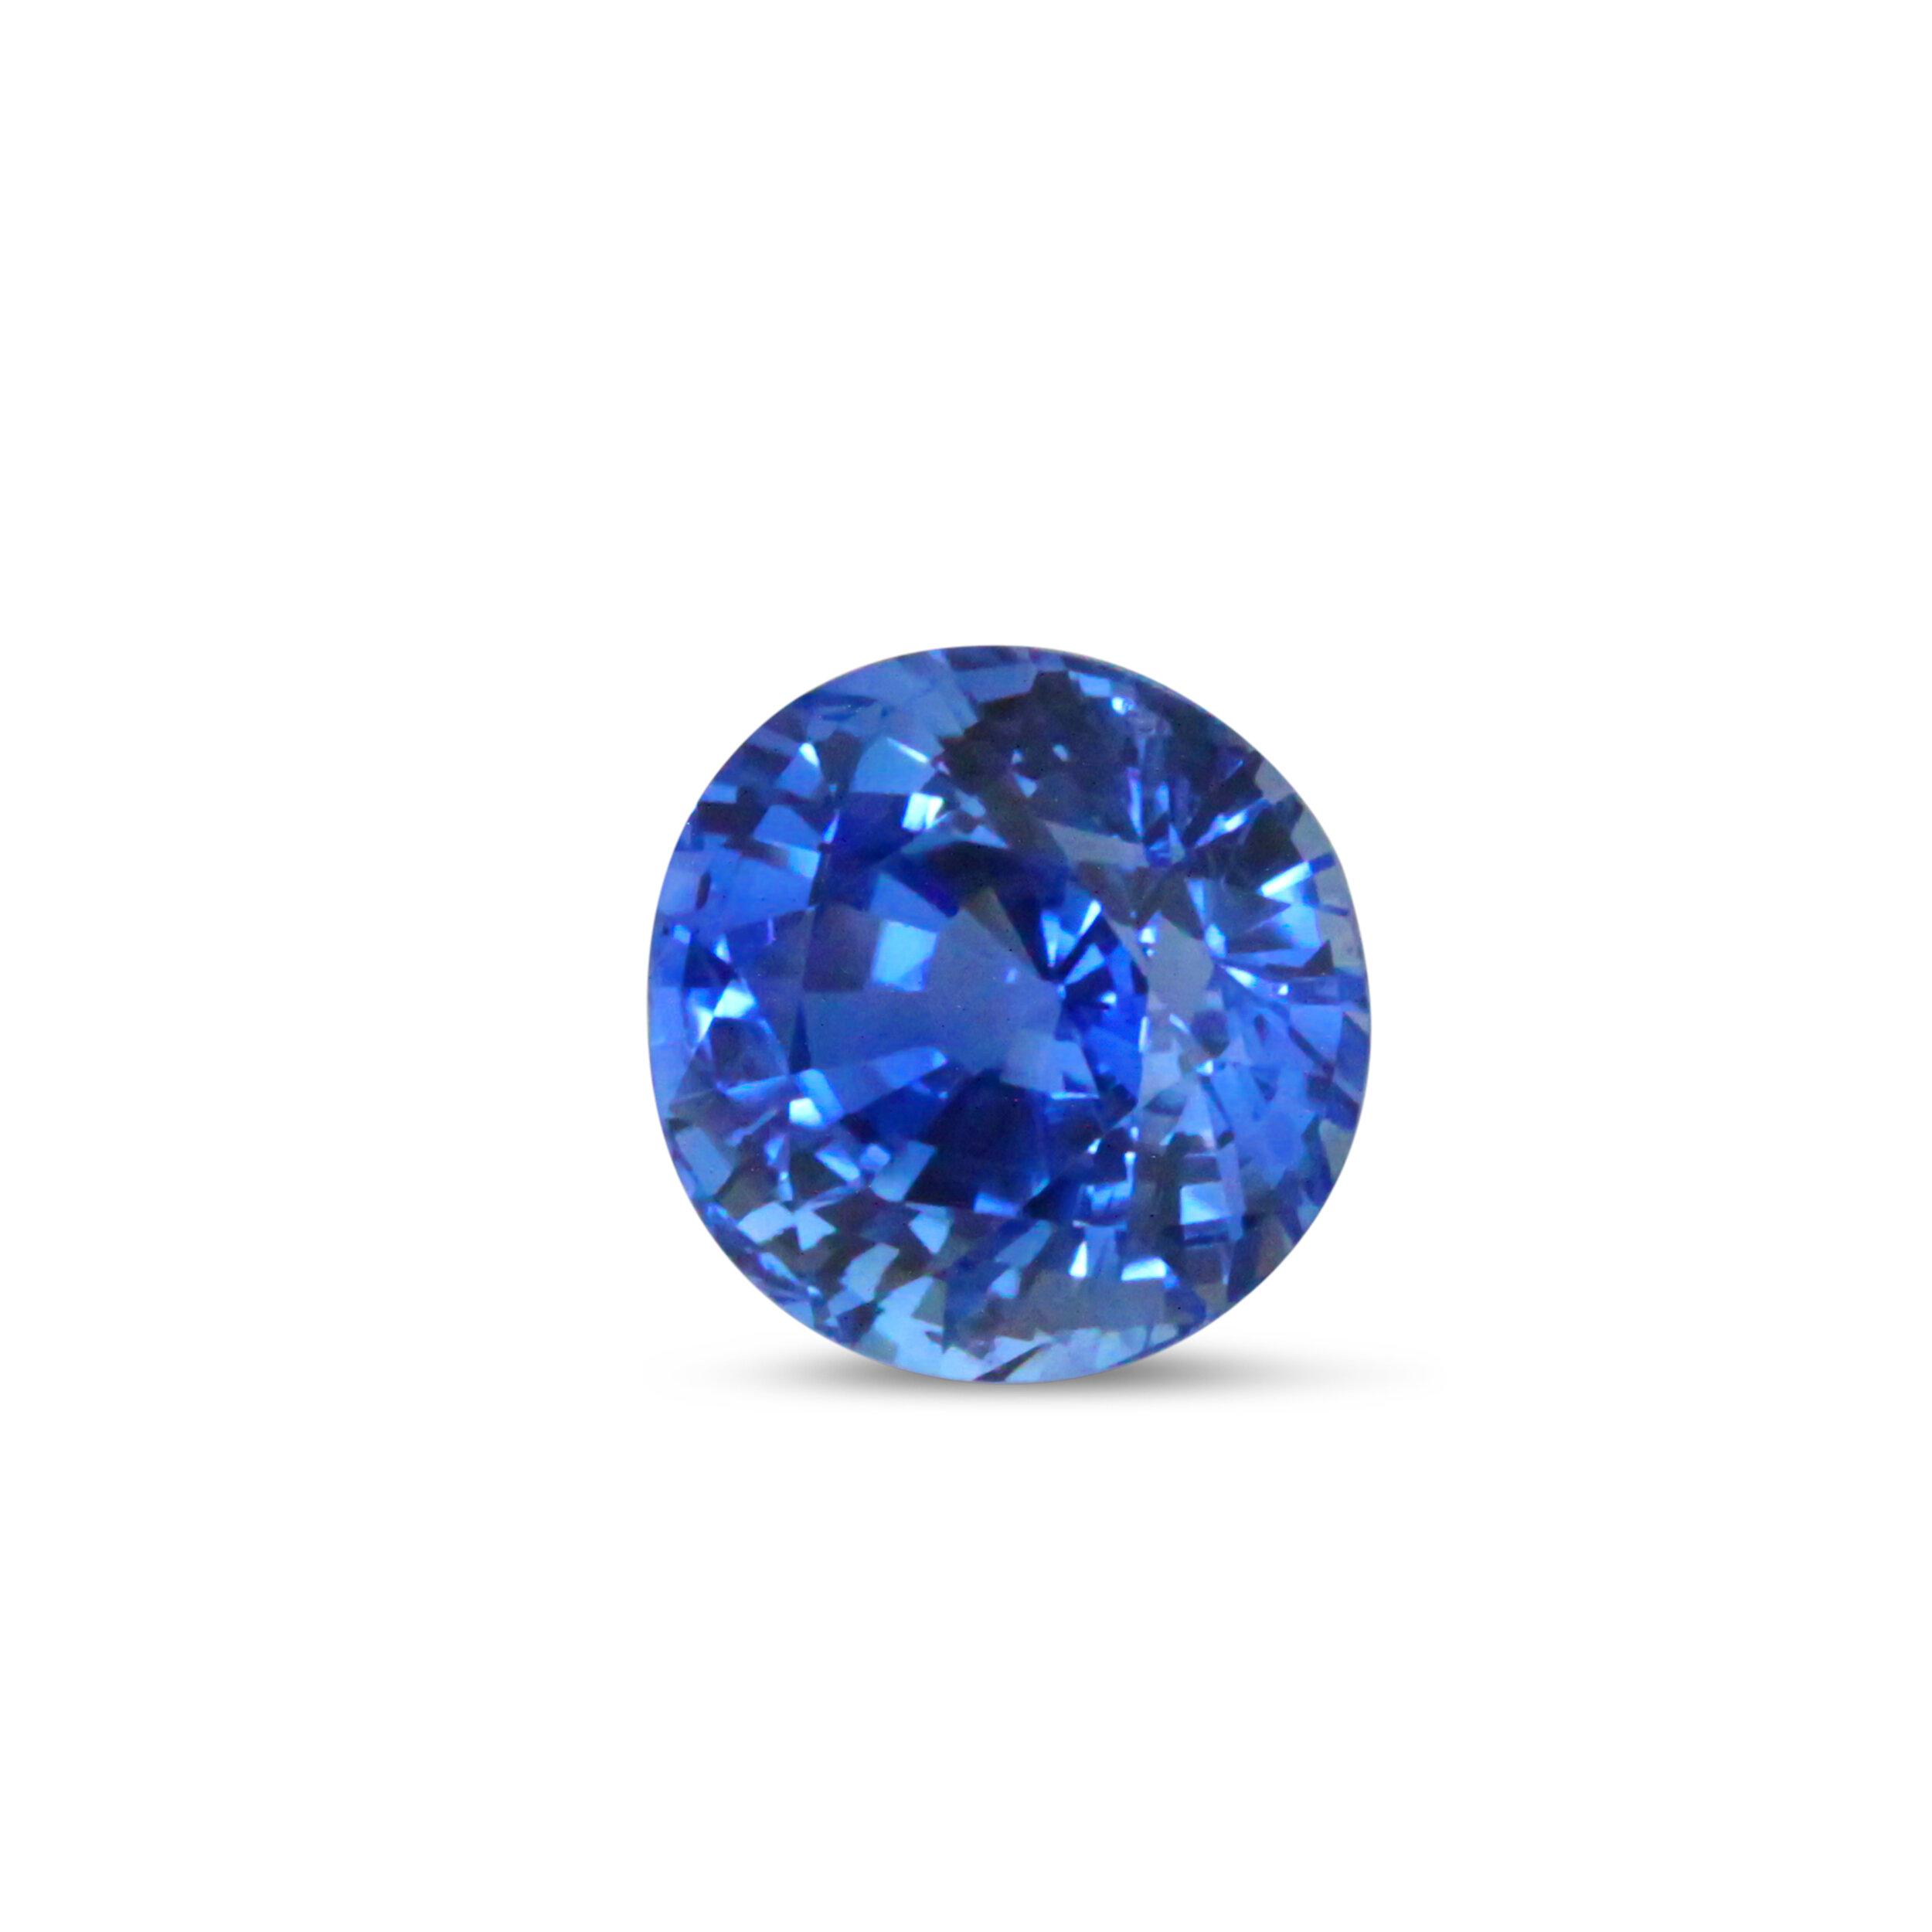 3 ct Unheated Ceylon Sapphire, AGL